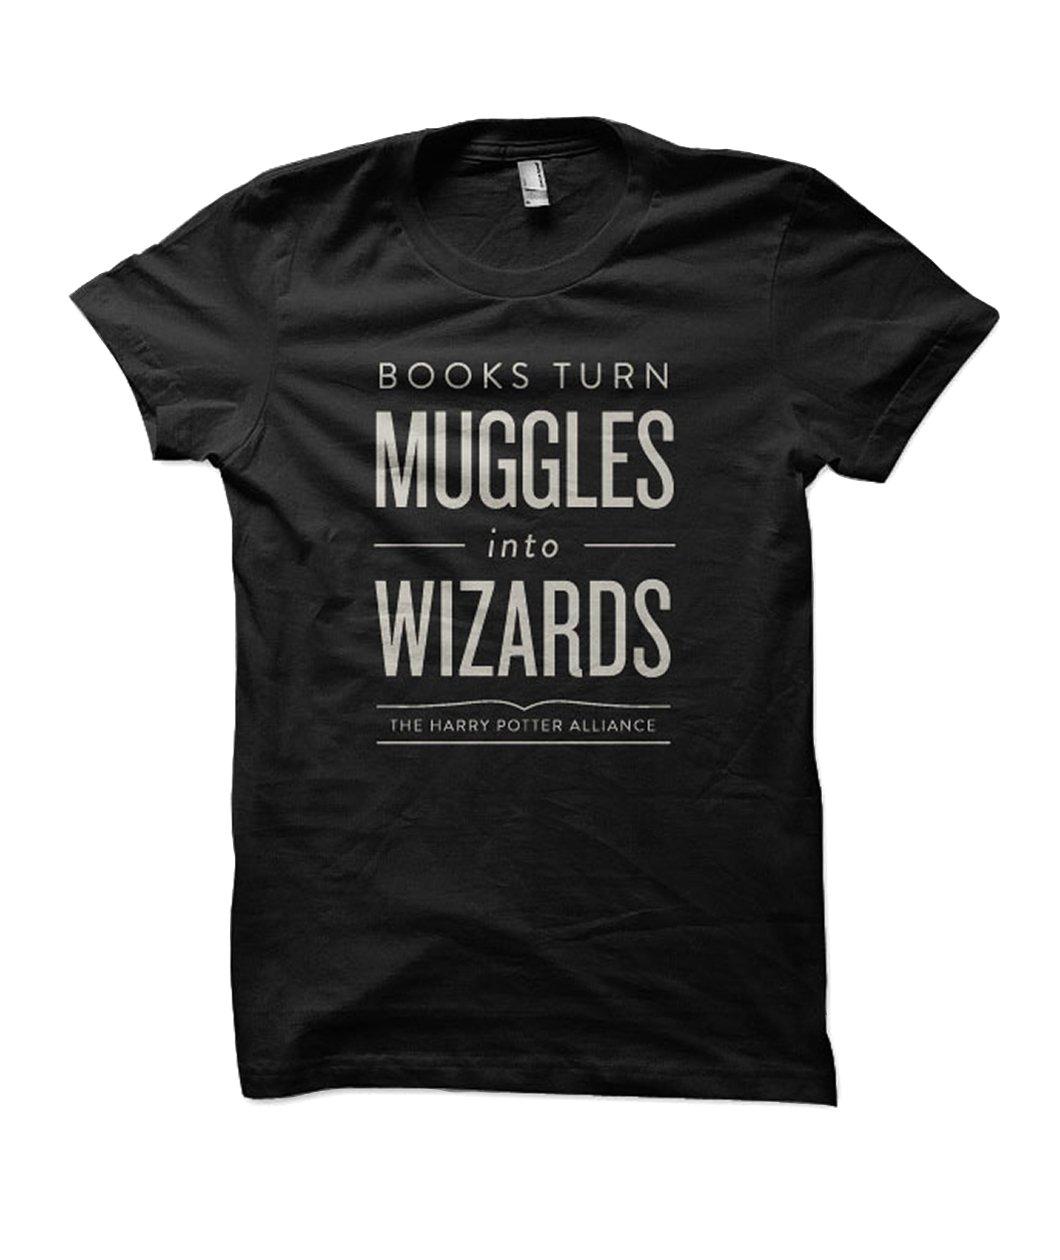 books-turn-m909d.jpg